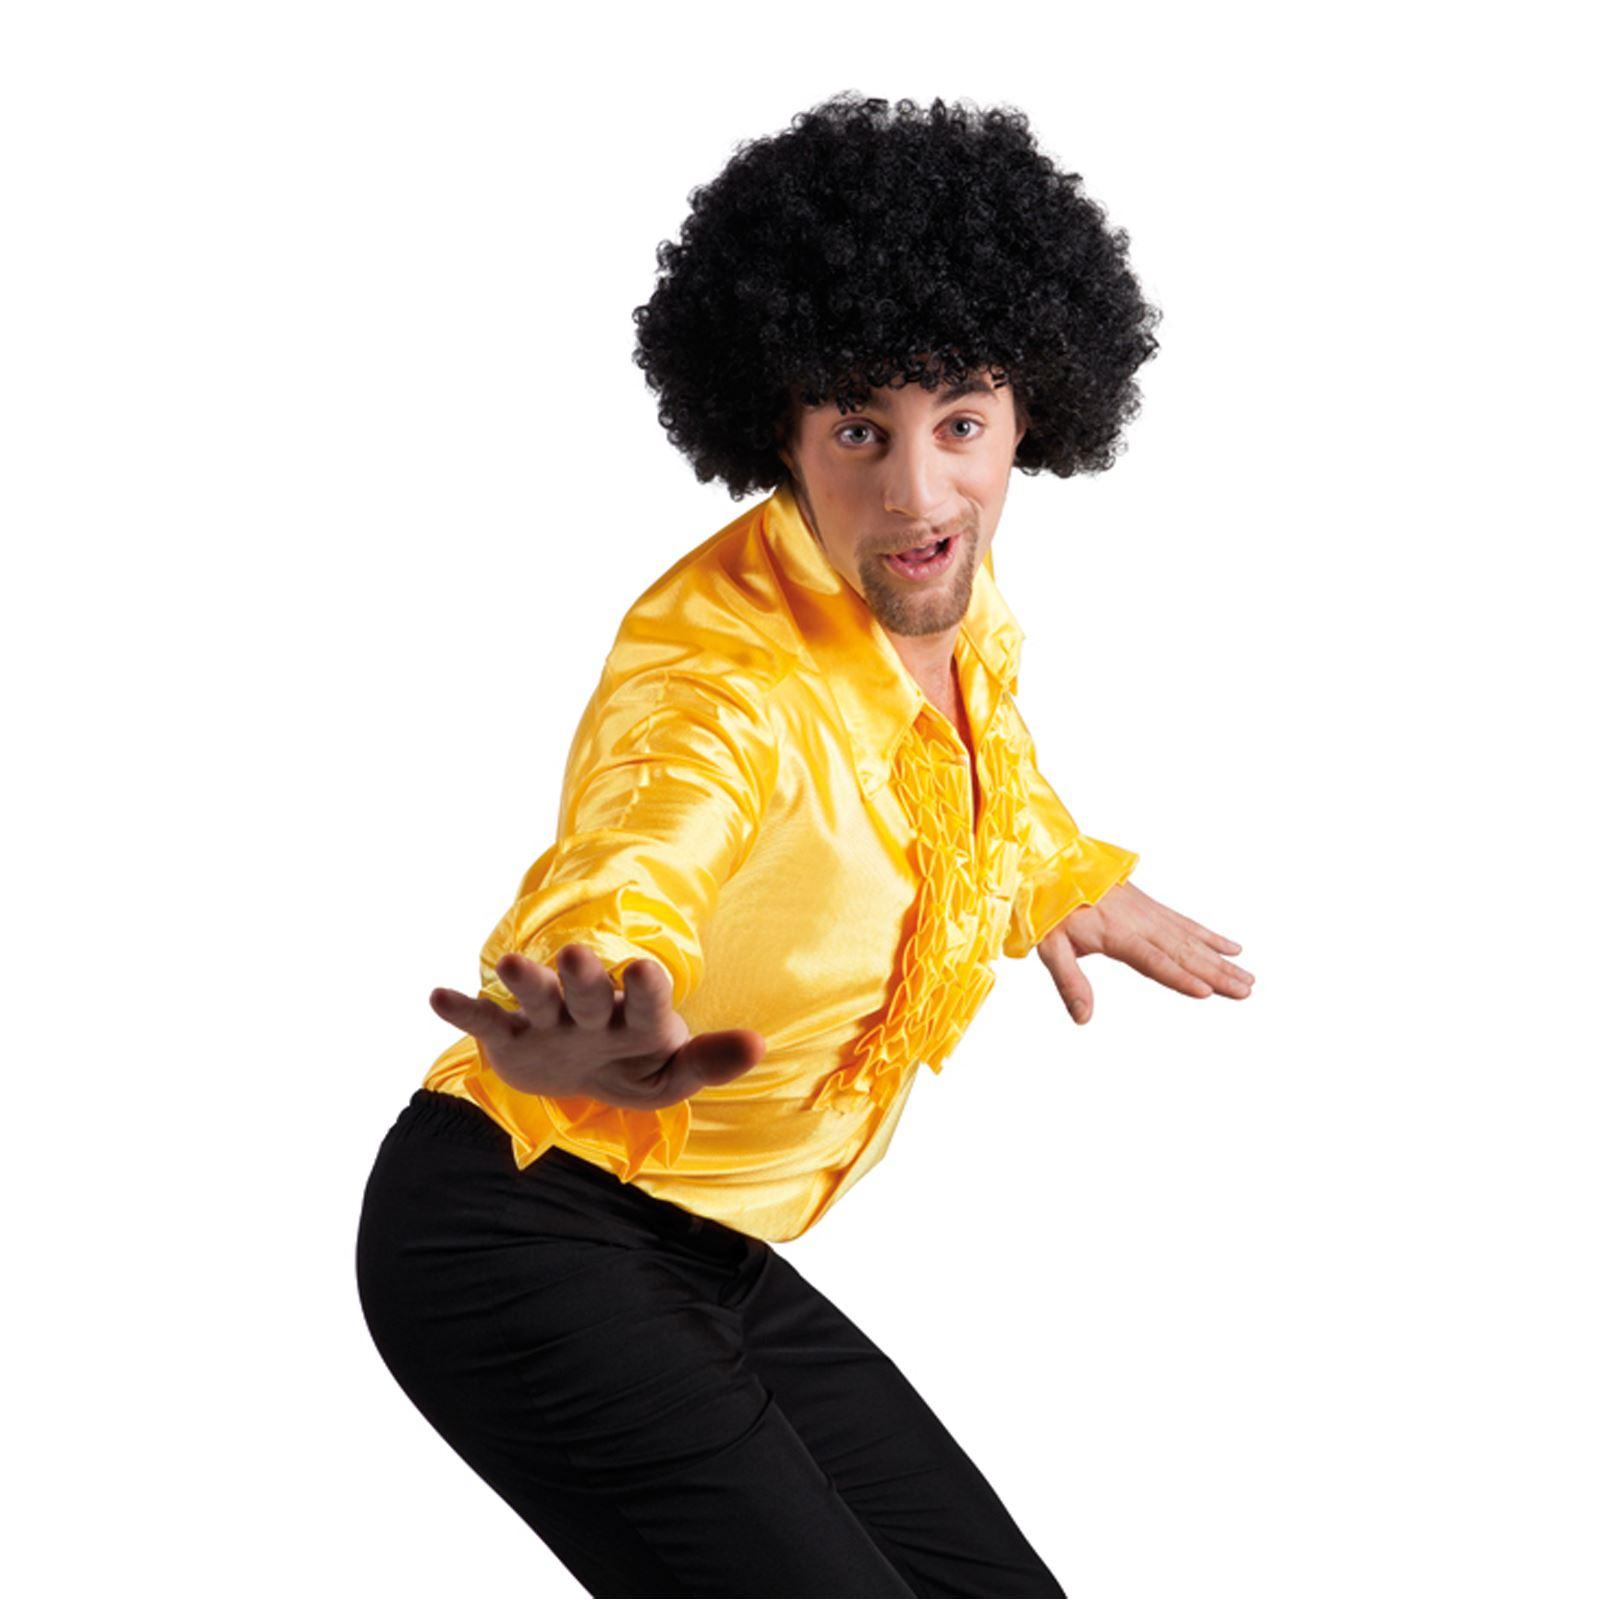 Mens-Disco-Night-Party-Ruffle-Shirt-Fever-Fancy-  sc 1 st  eBay & Mens Disco Night Party Ruffle Shirt Fever Fancy Dress Costume ...